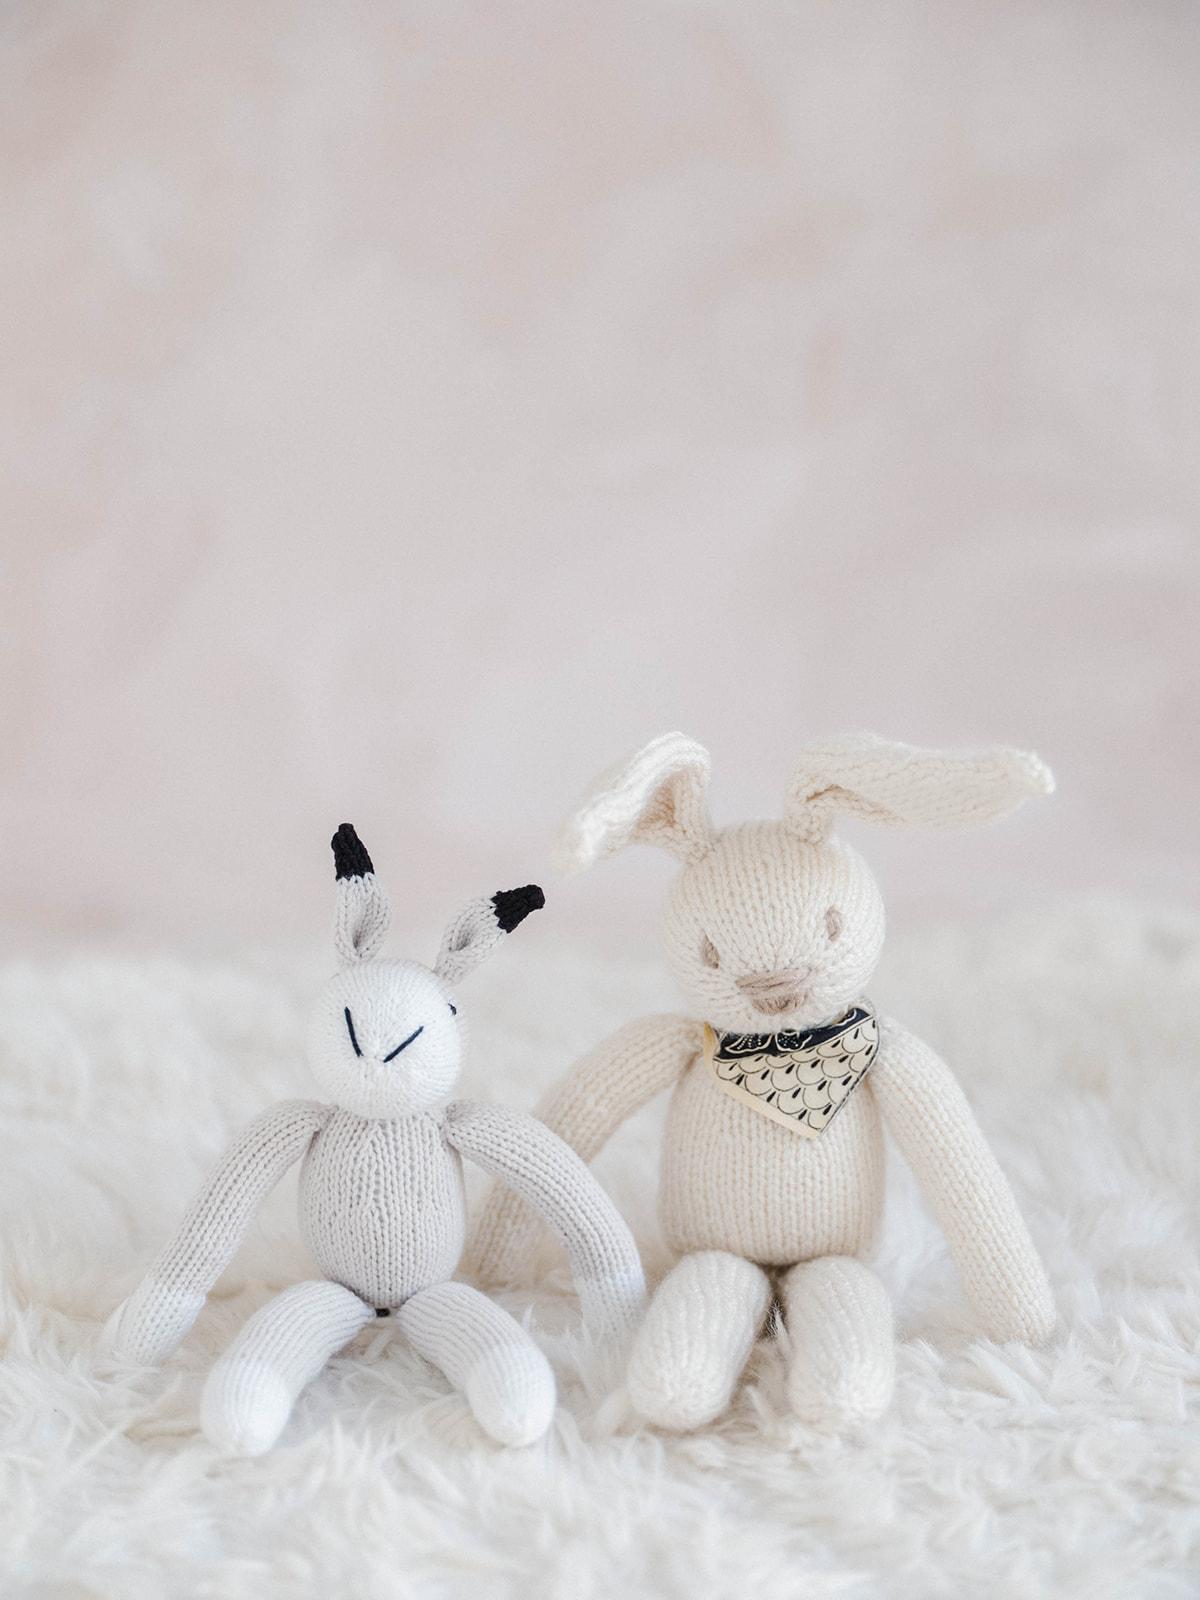 close up of handmade stuffed animal bunnies